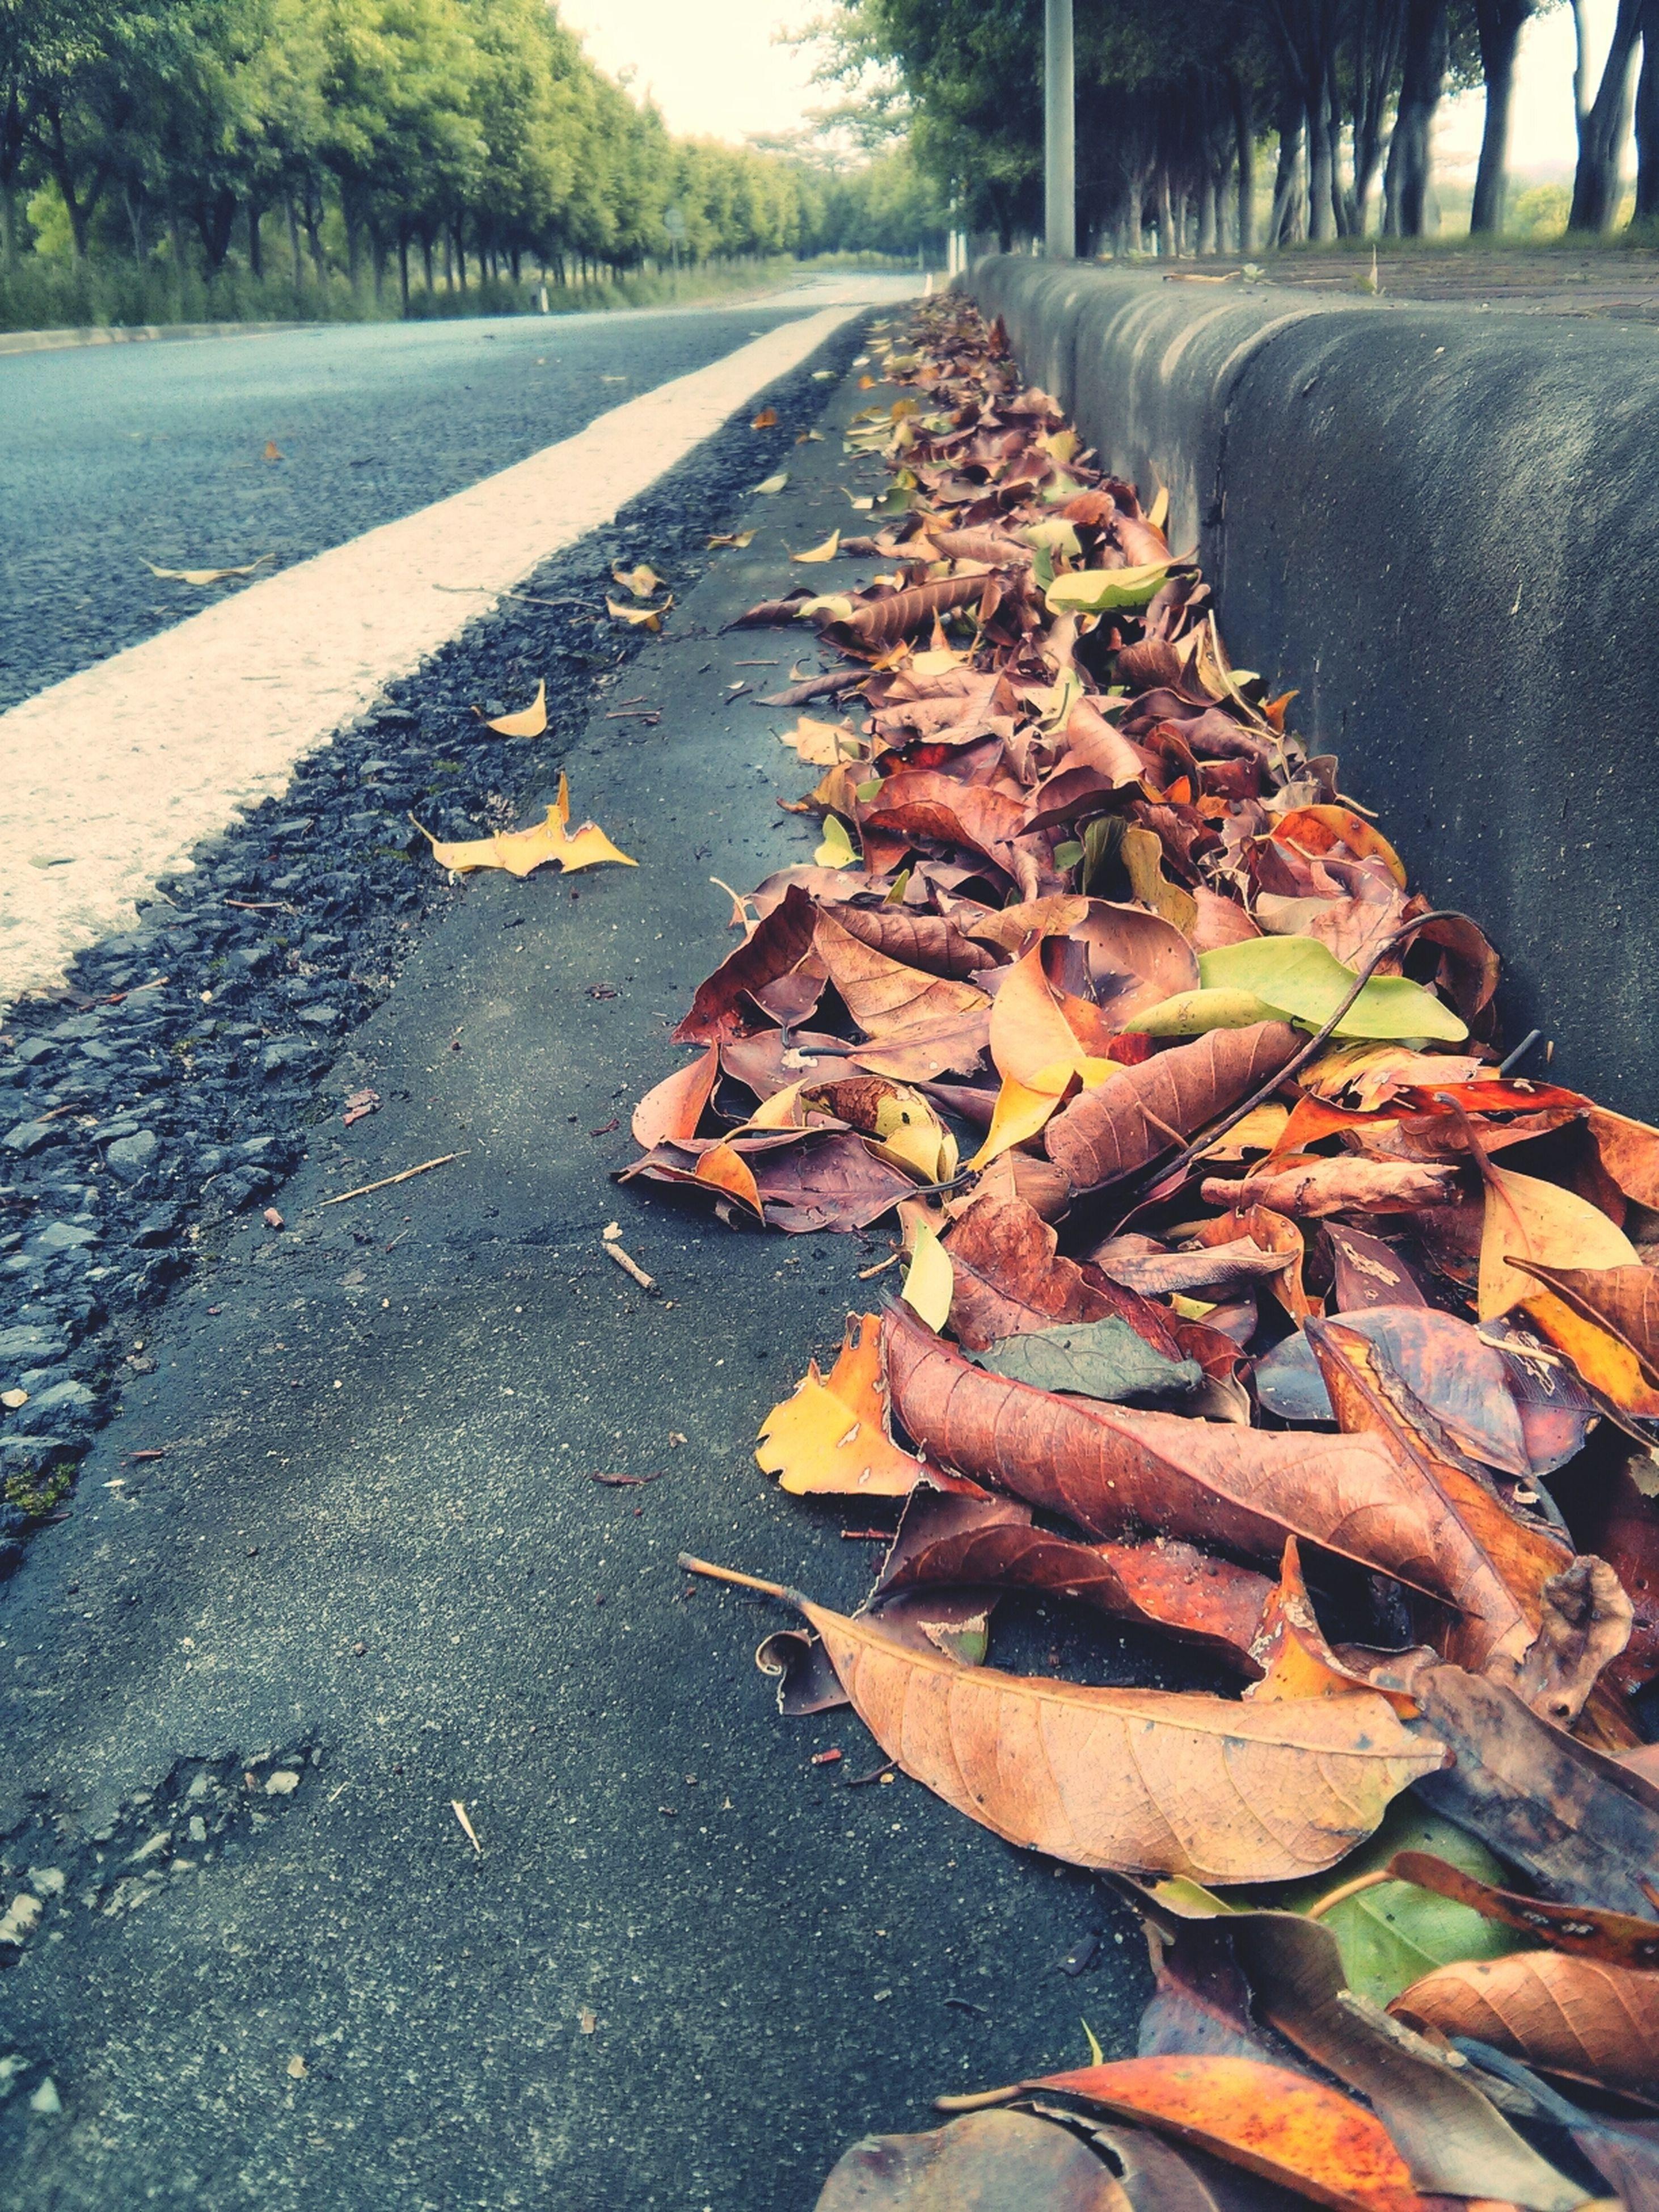 autumn, transportation, leaf, season, change, the way forward, street, diminishing perspective, road, leaves, dry, vanishing point, fallen, asphalt, surface level, road marking, outdoors, day, nature, tree